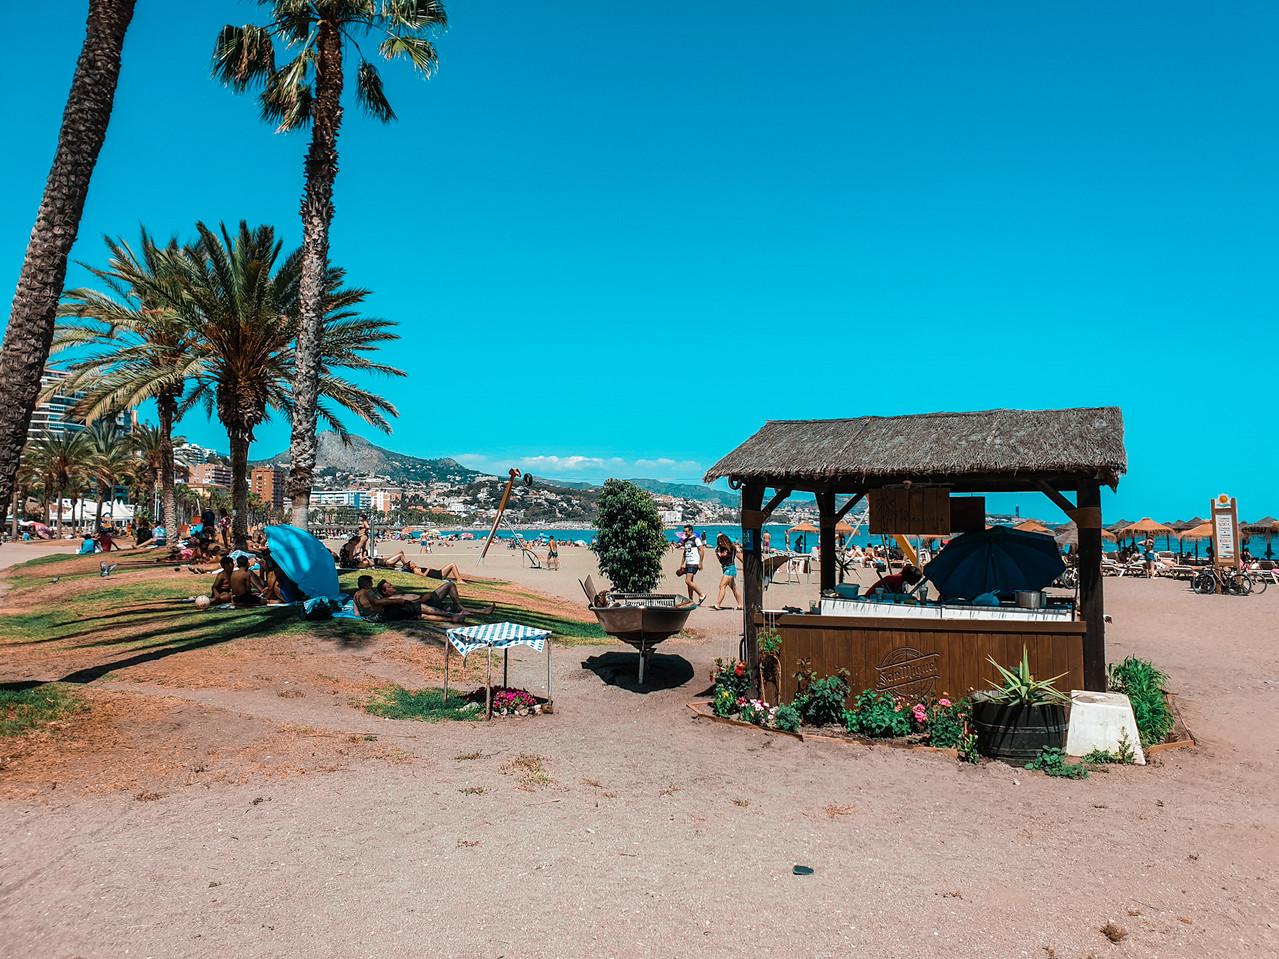 Playa de la Malagueta - Malaga Strand Olivia Libi